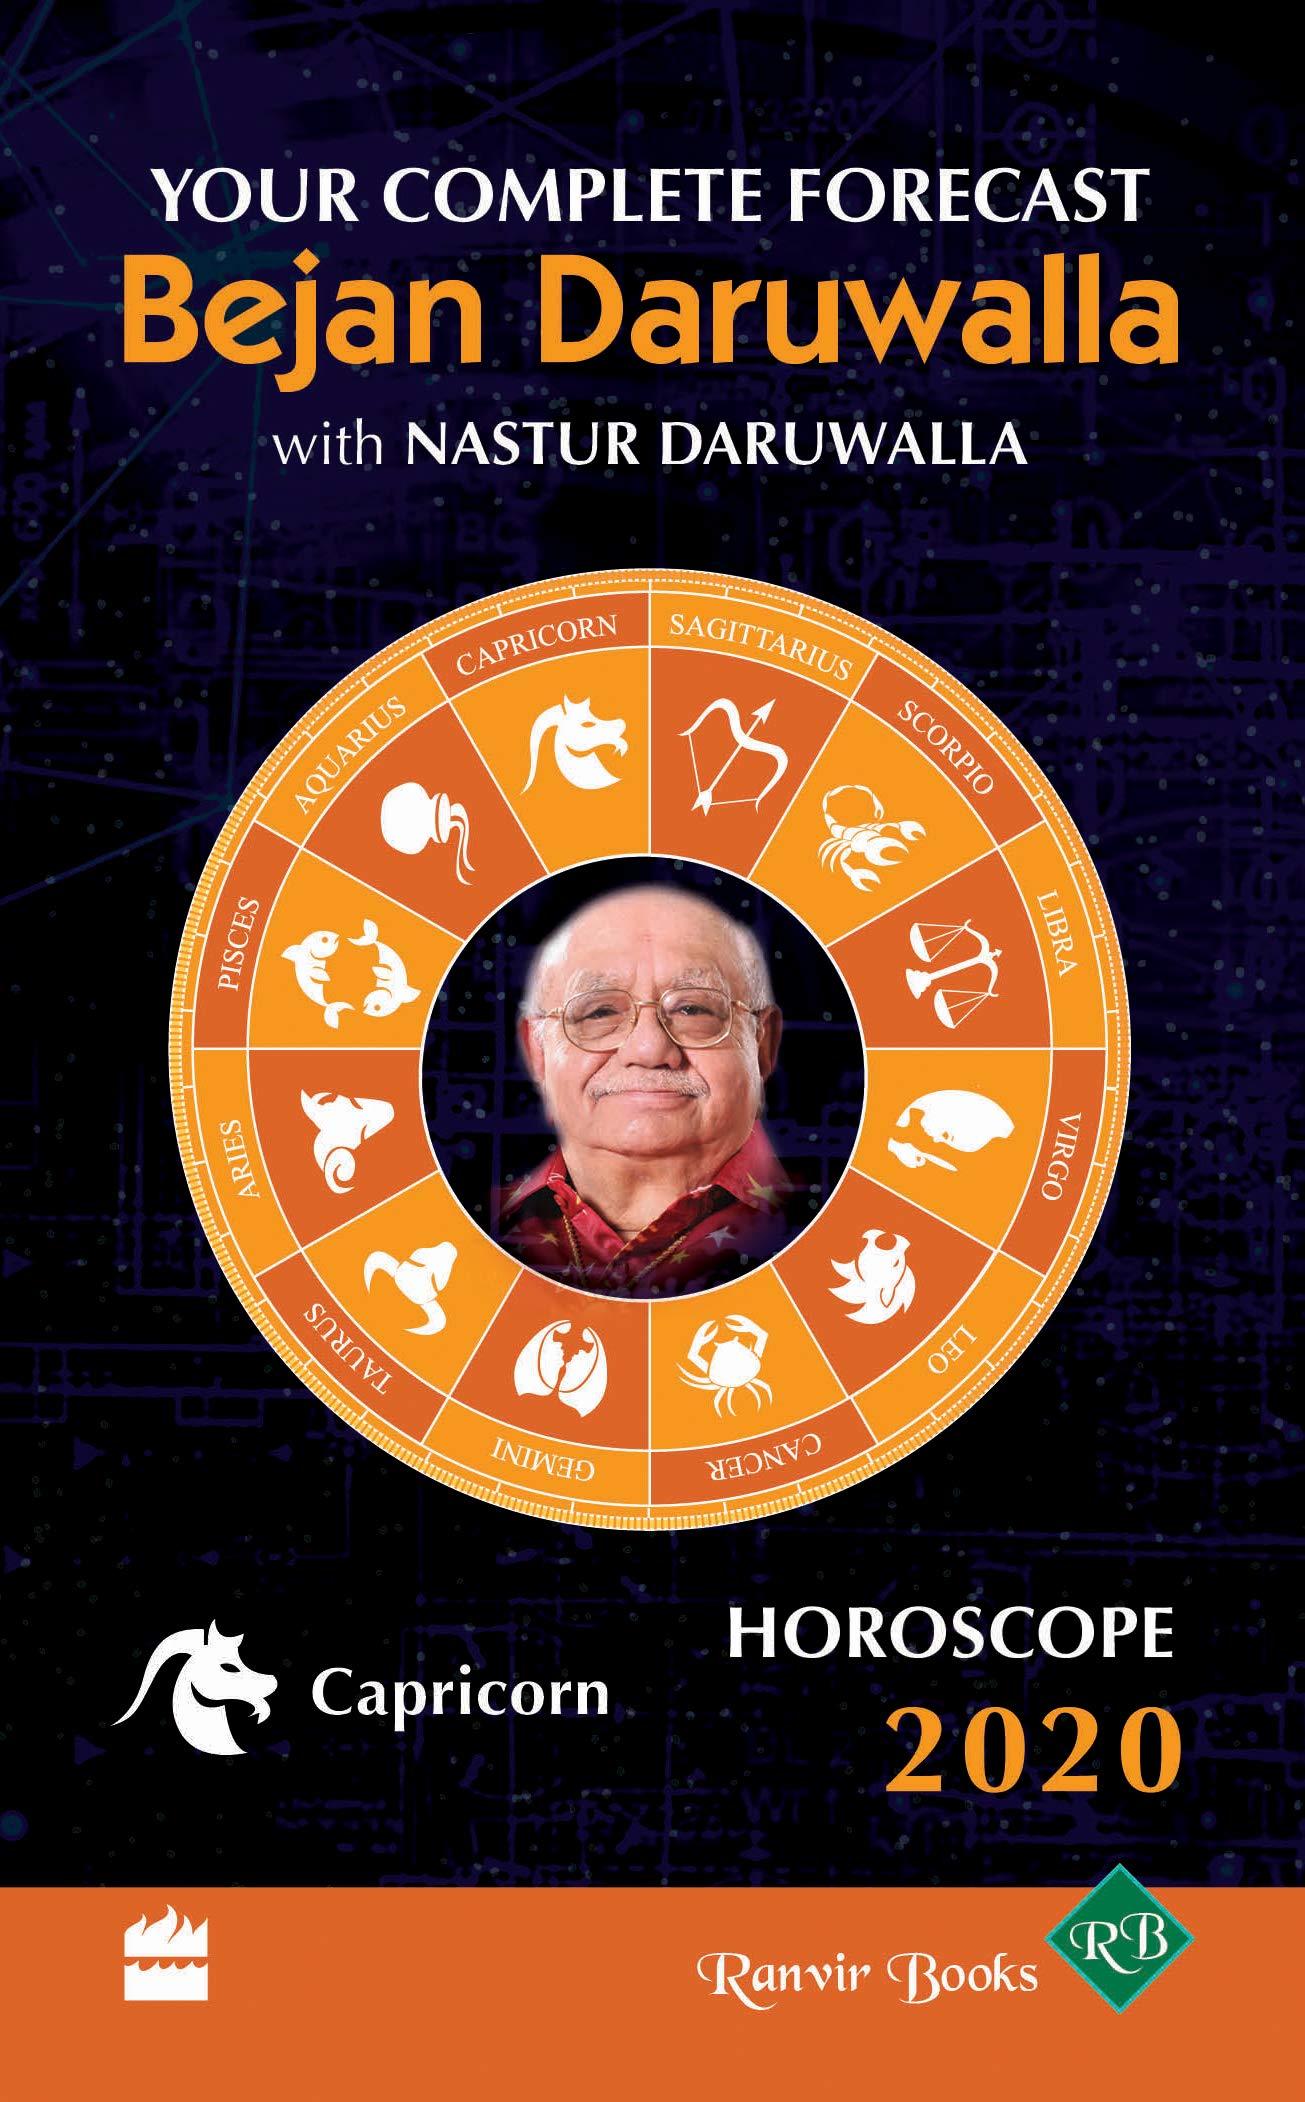 horoscope for capricorn march 26 2020